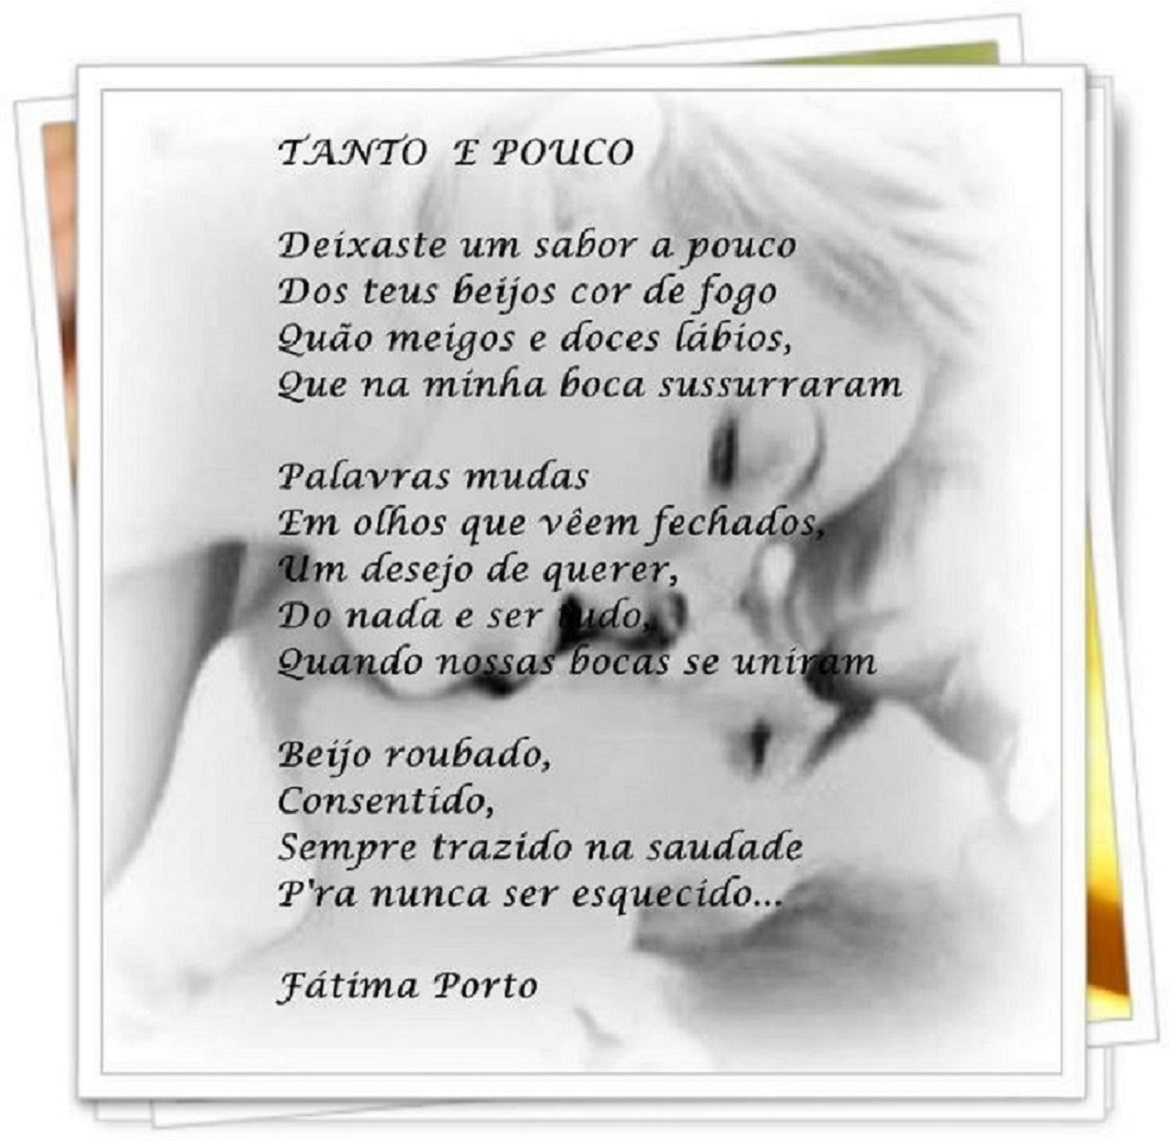 © FÁTIMA PORTO